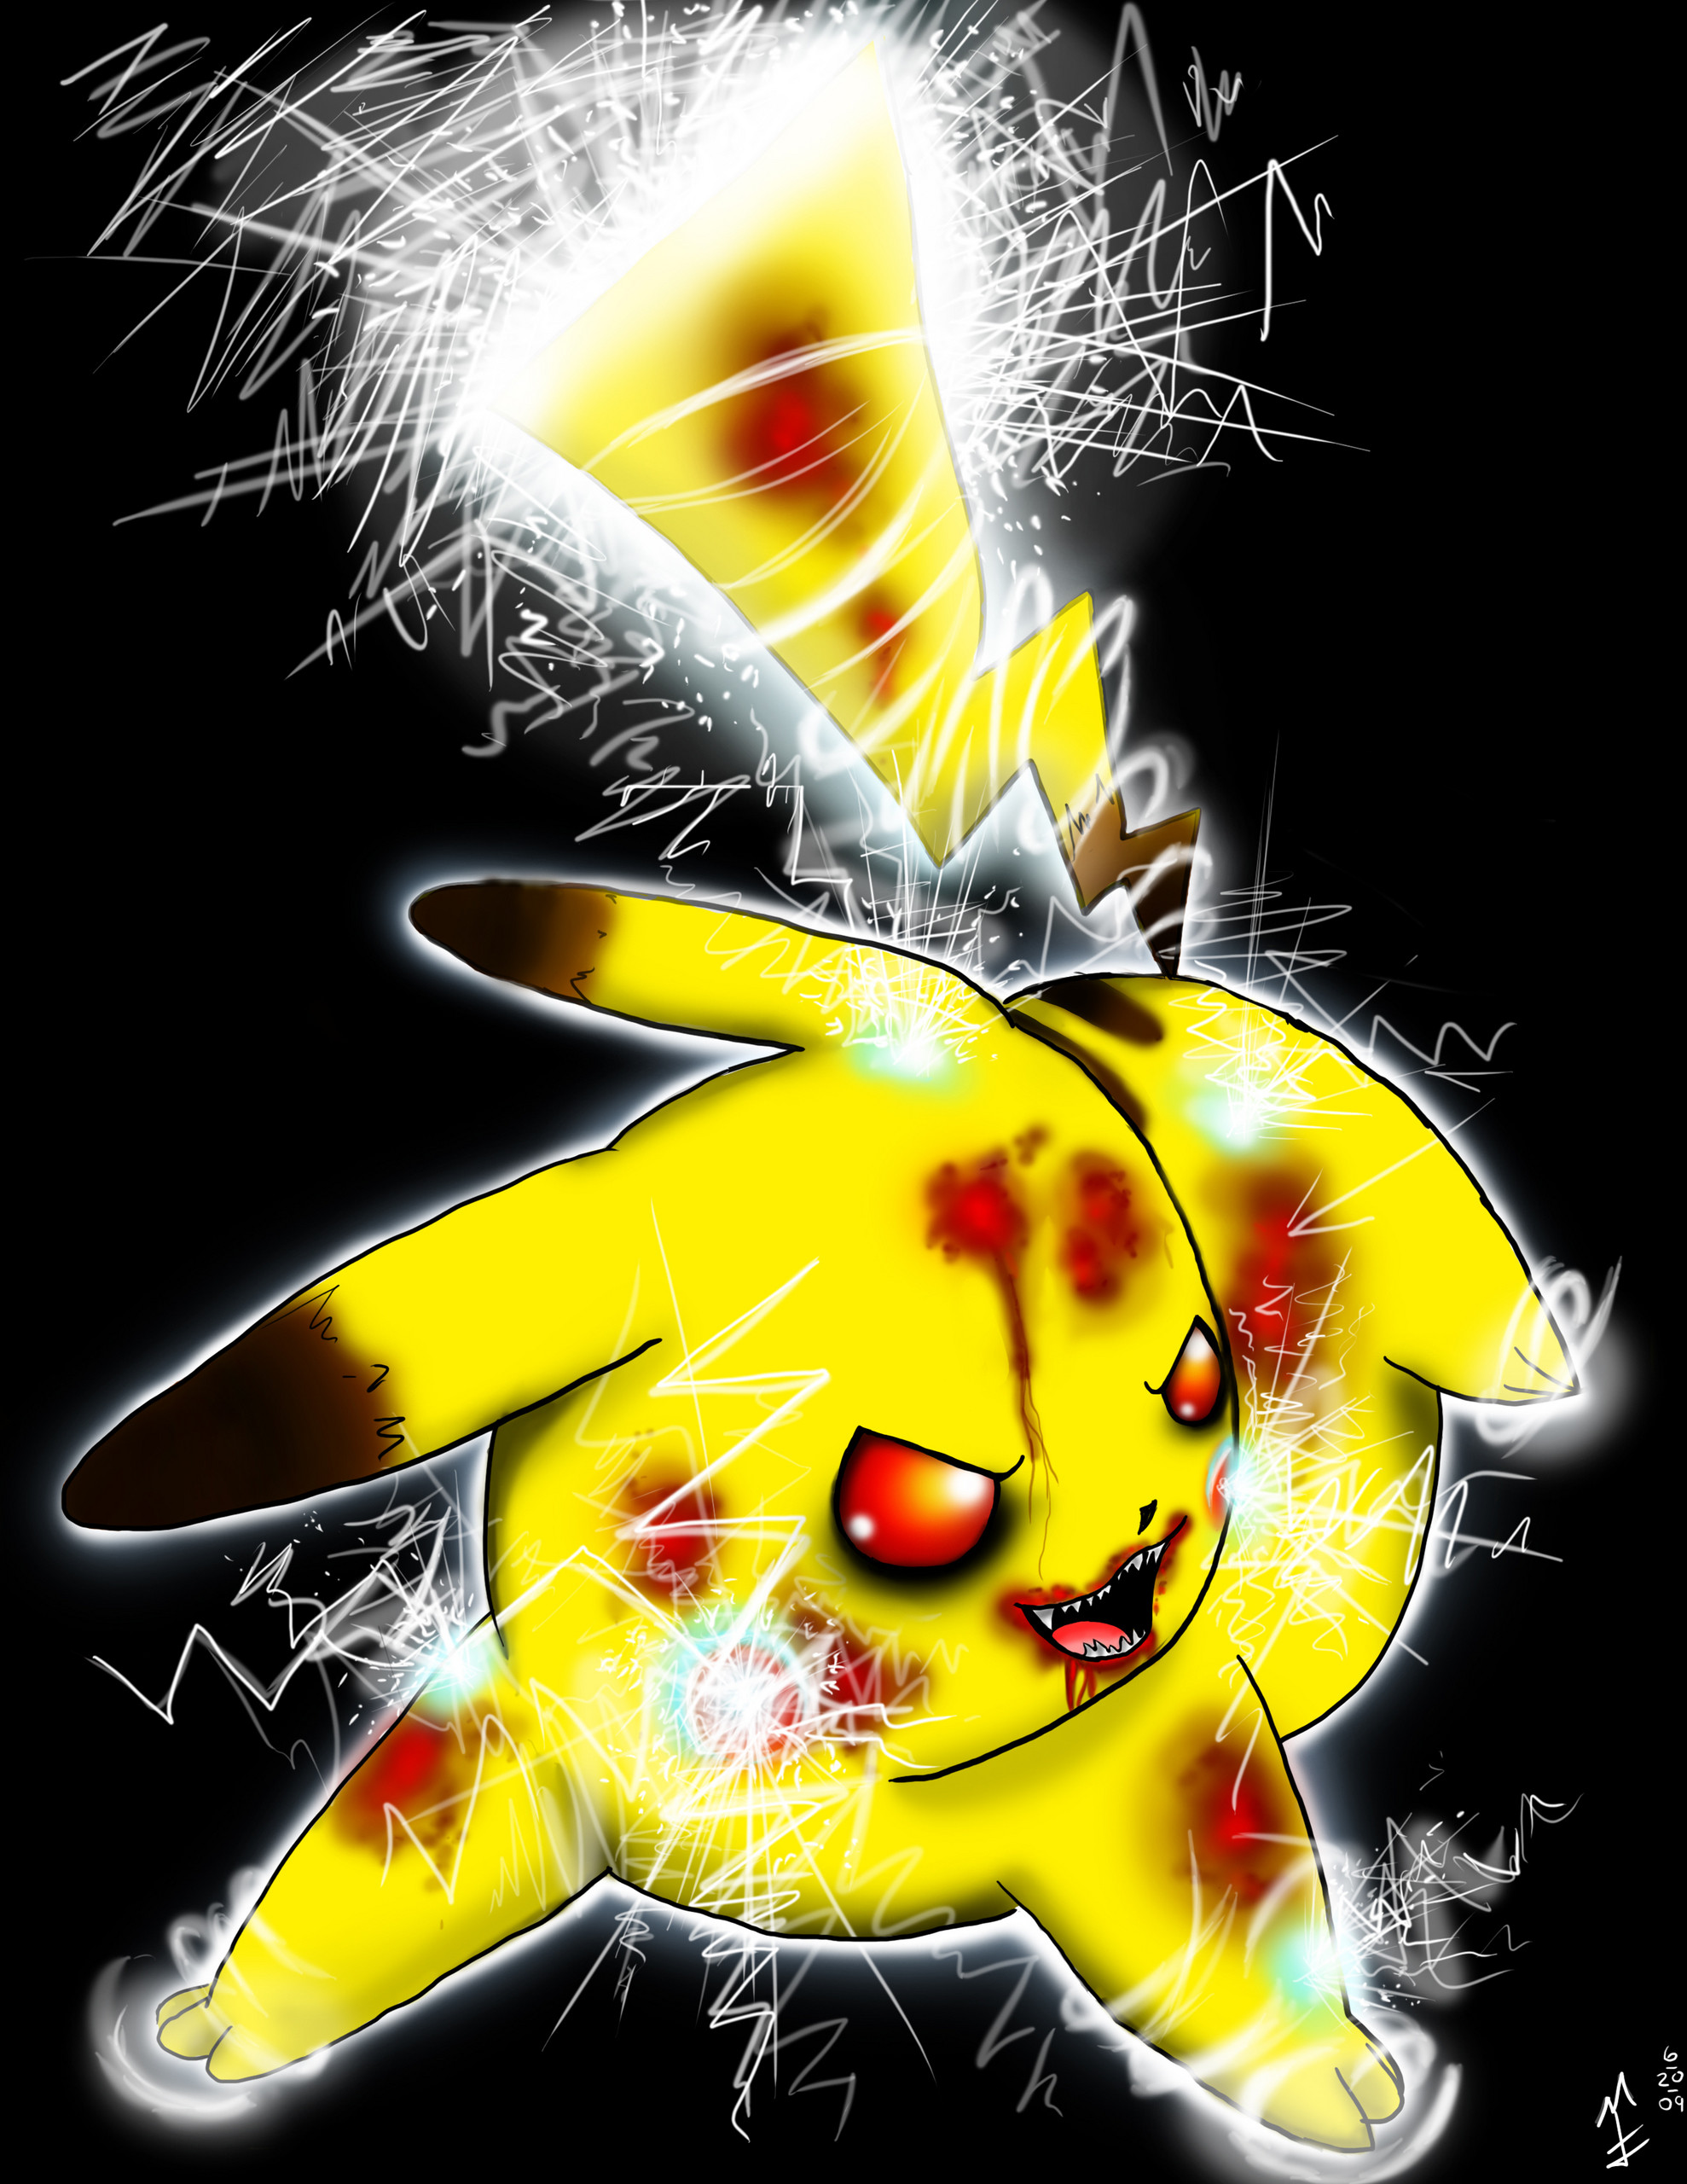 YoshiDude images My Pet Pikachu HD wallpaper and background photos